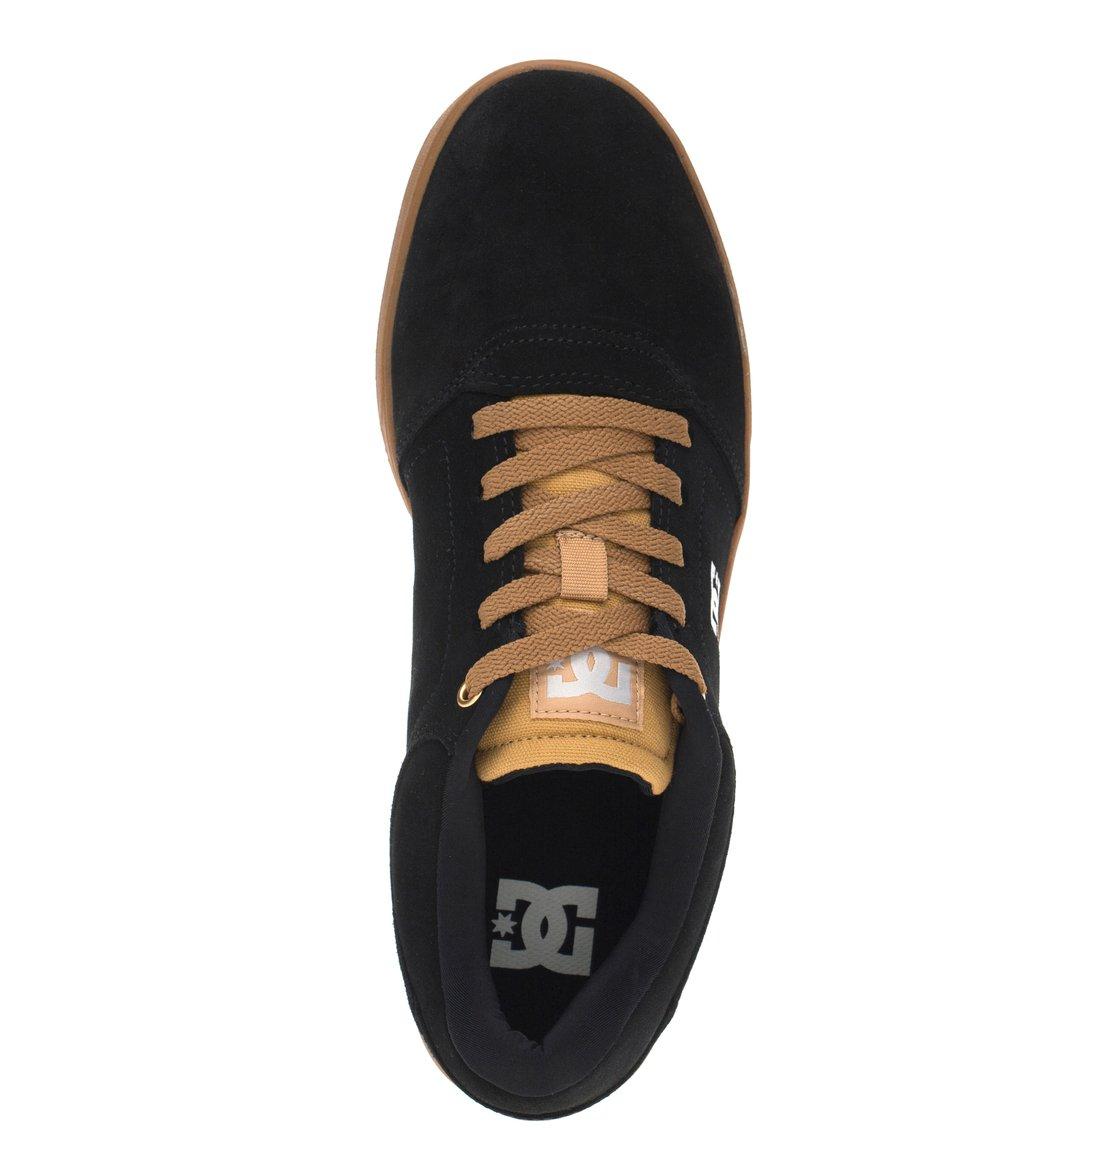 3 Tênis masculino Crisis LA Marrom BRADYS100029L DC Shoes 7bb0138f49f15